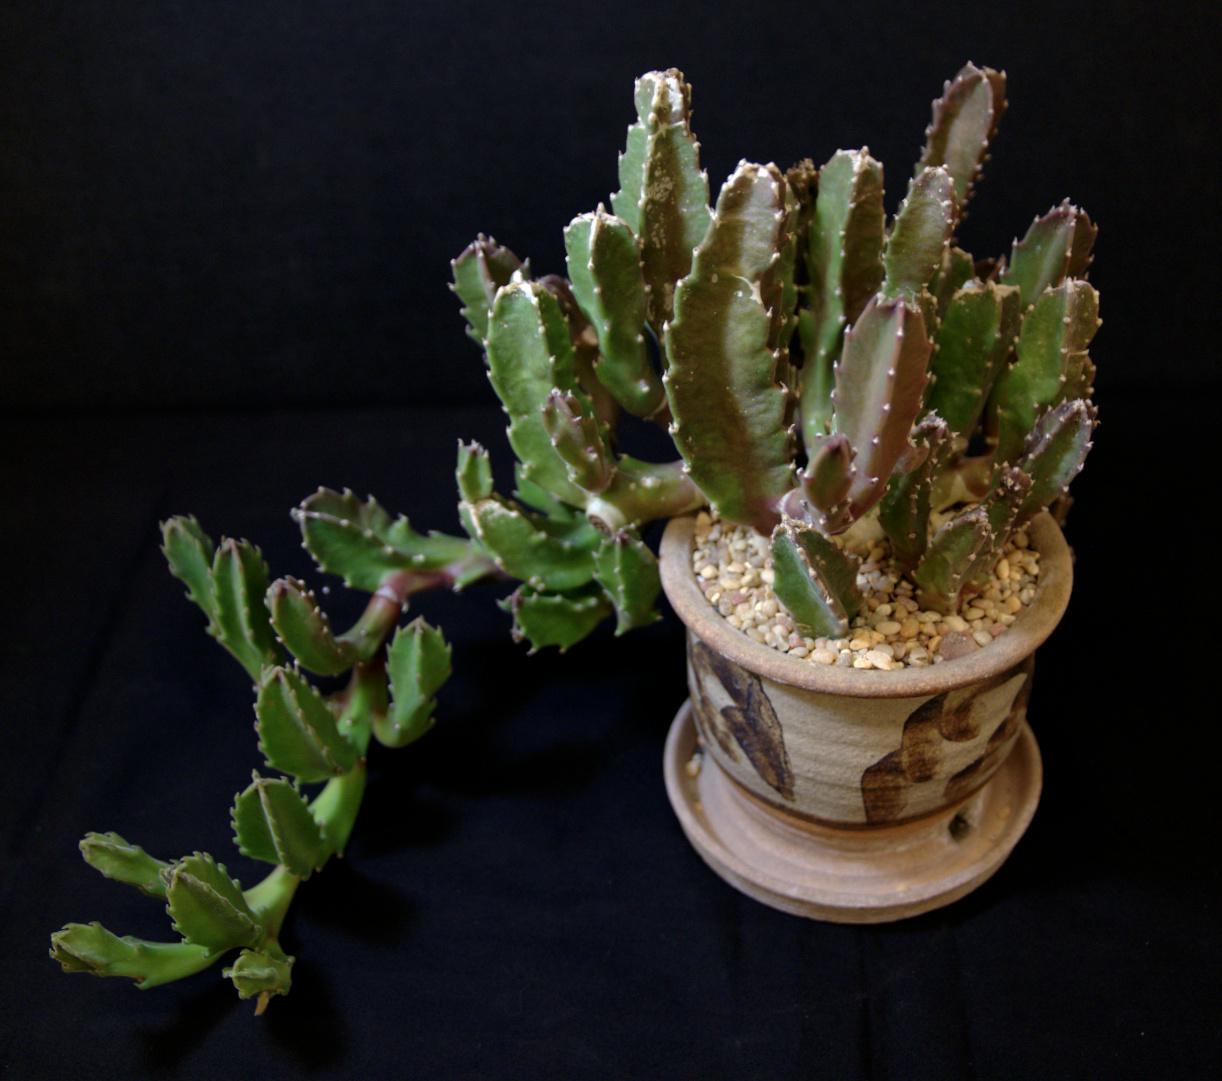 SCCSS 2015 07 - Winner Intermediate Succulent - Phyllis DeCrescenzo - Stapelia gigantea